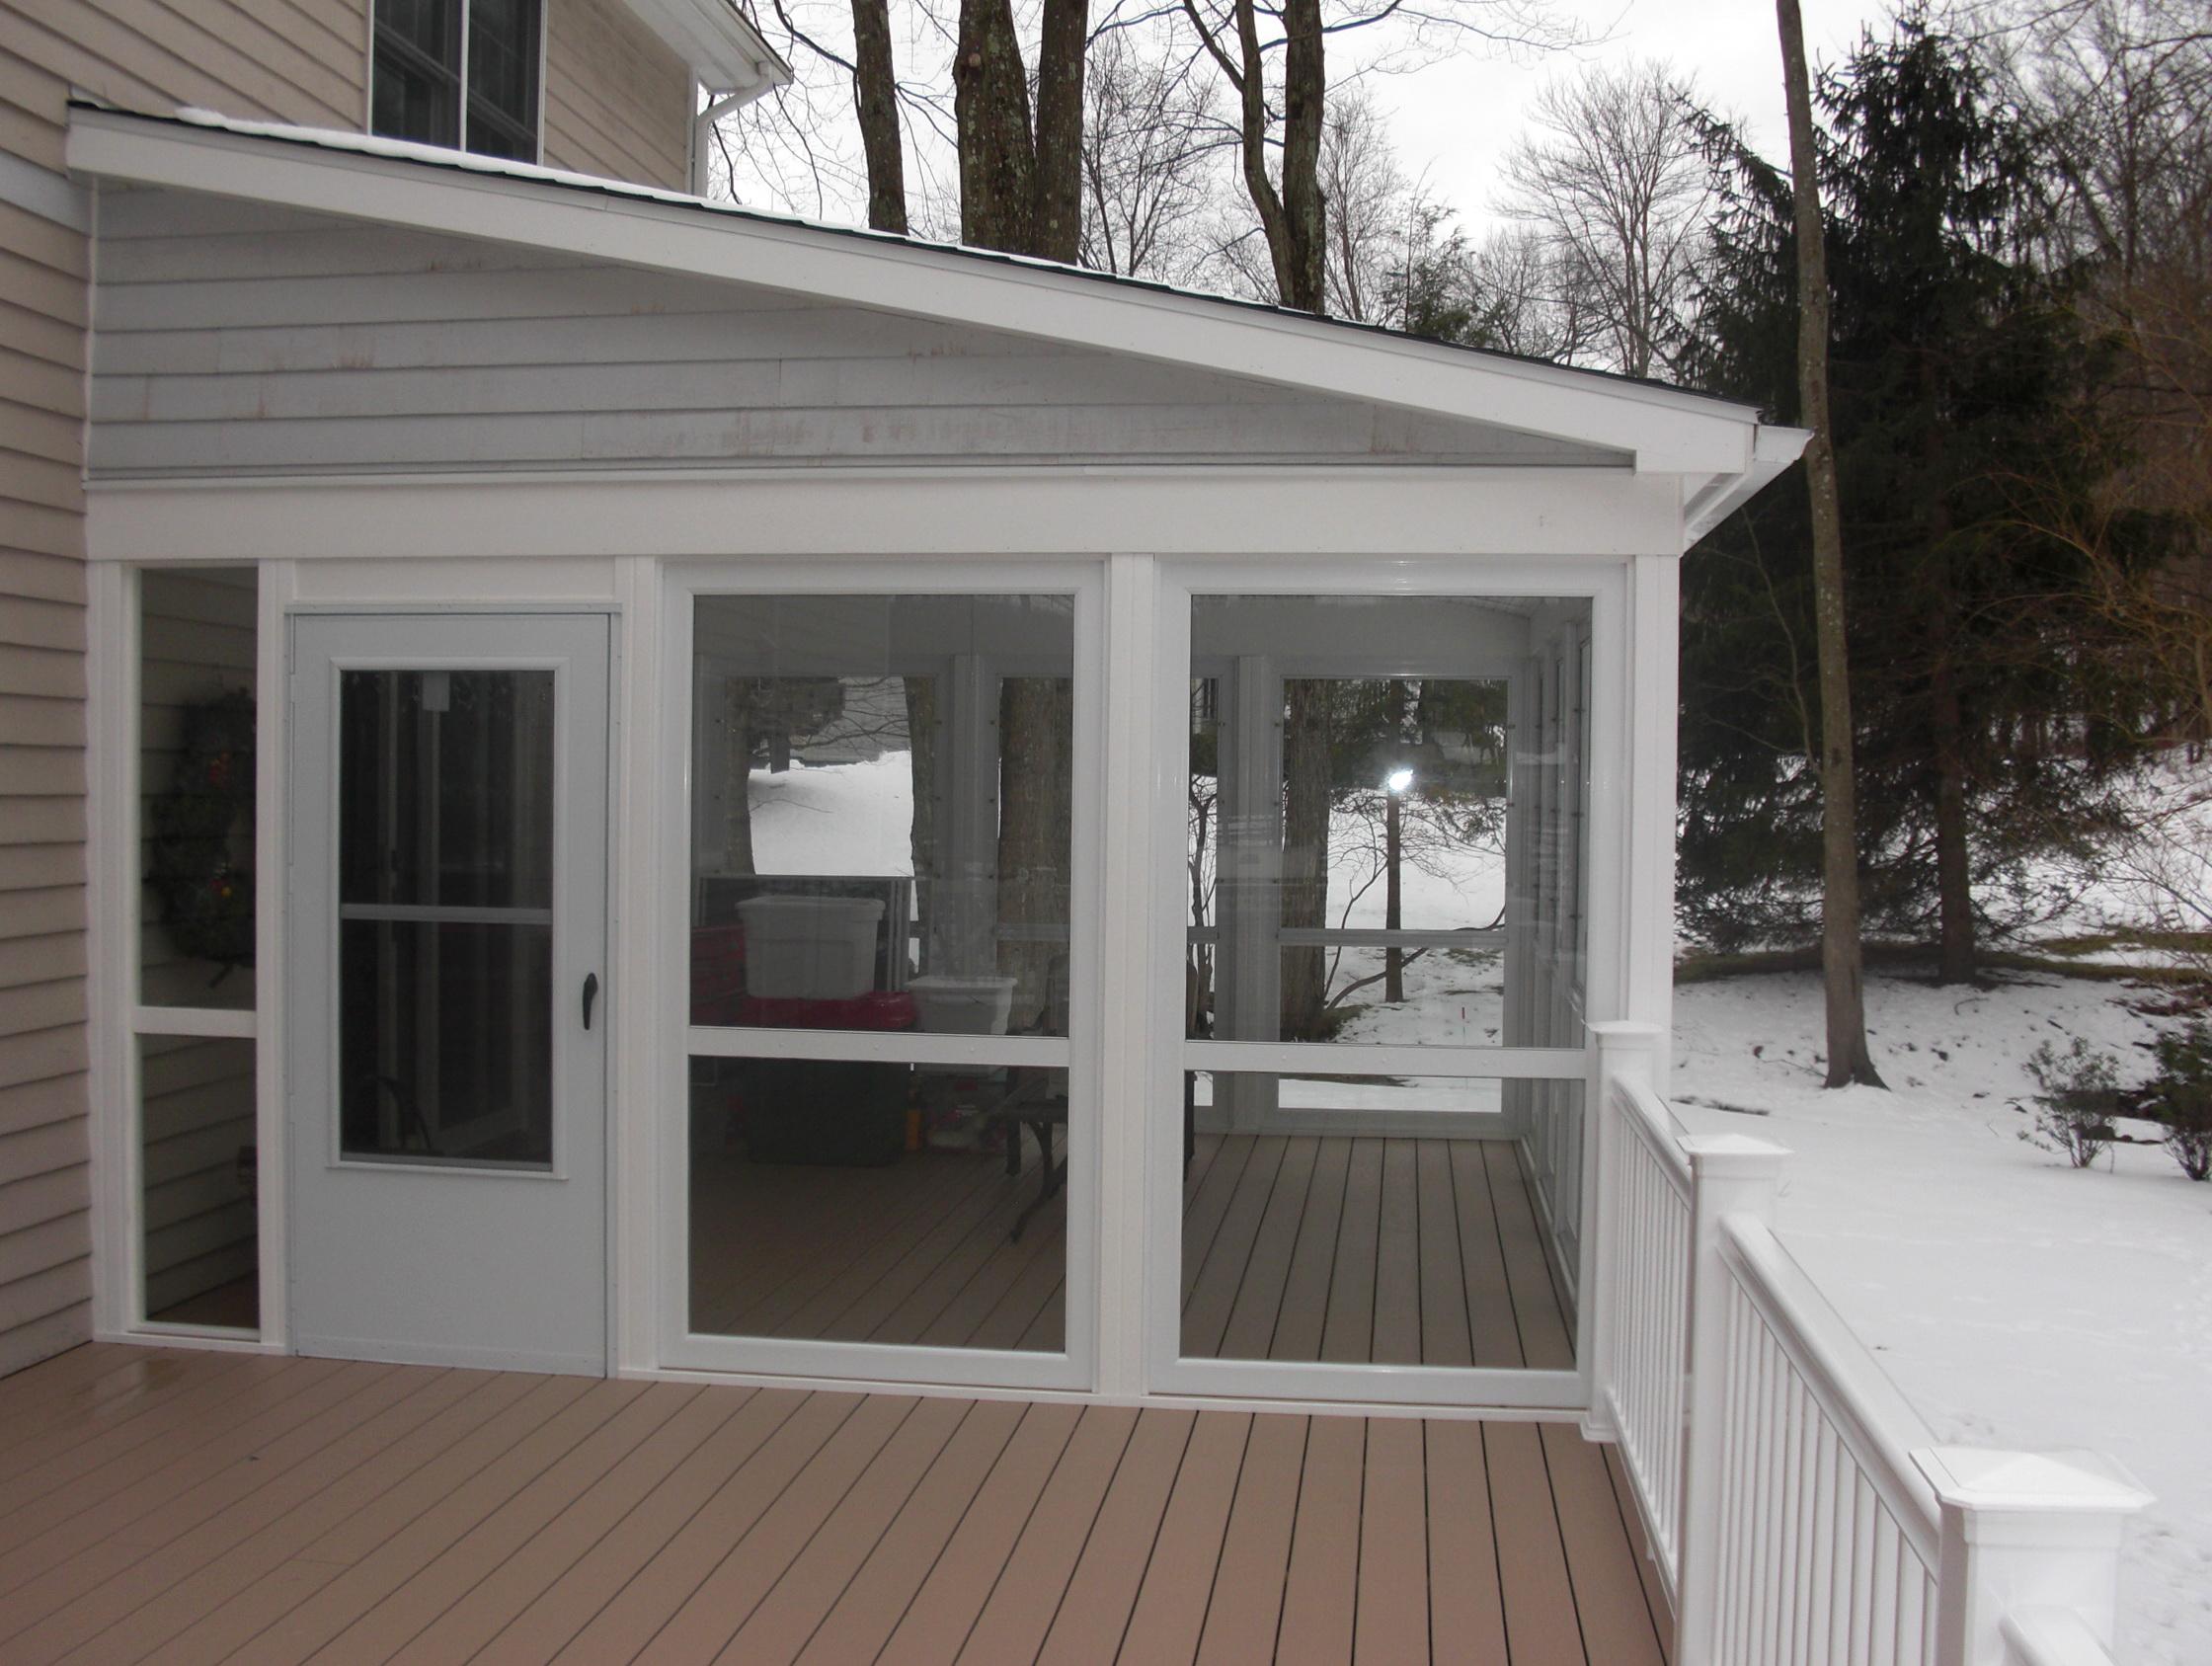 Glassed In Porch Cost Home Design Ideas